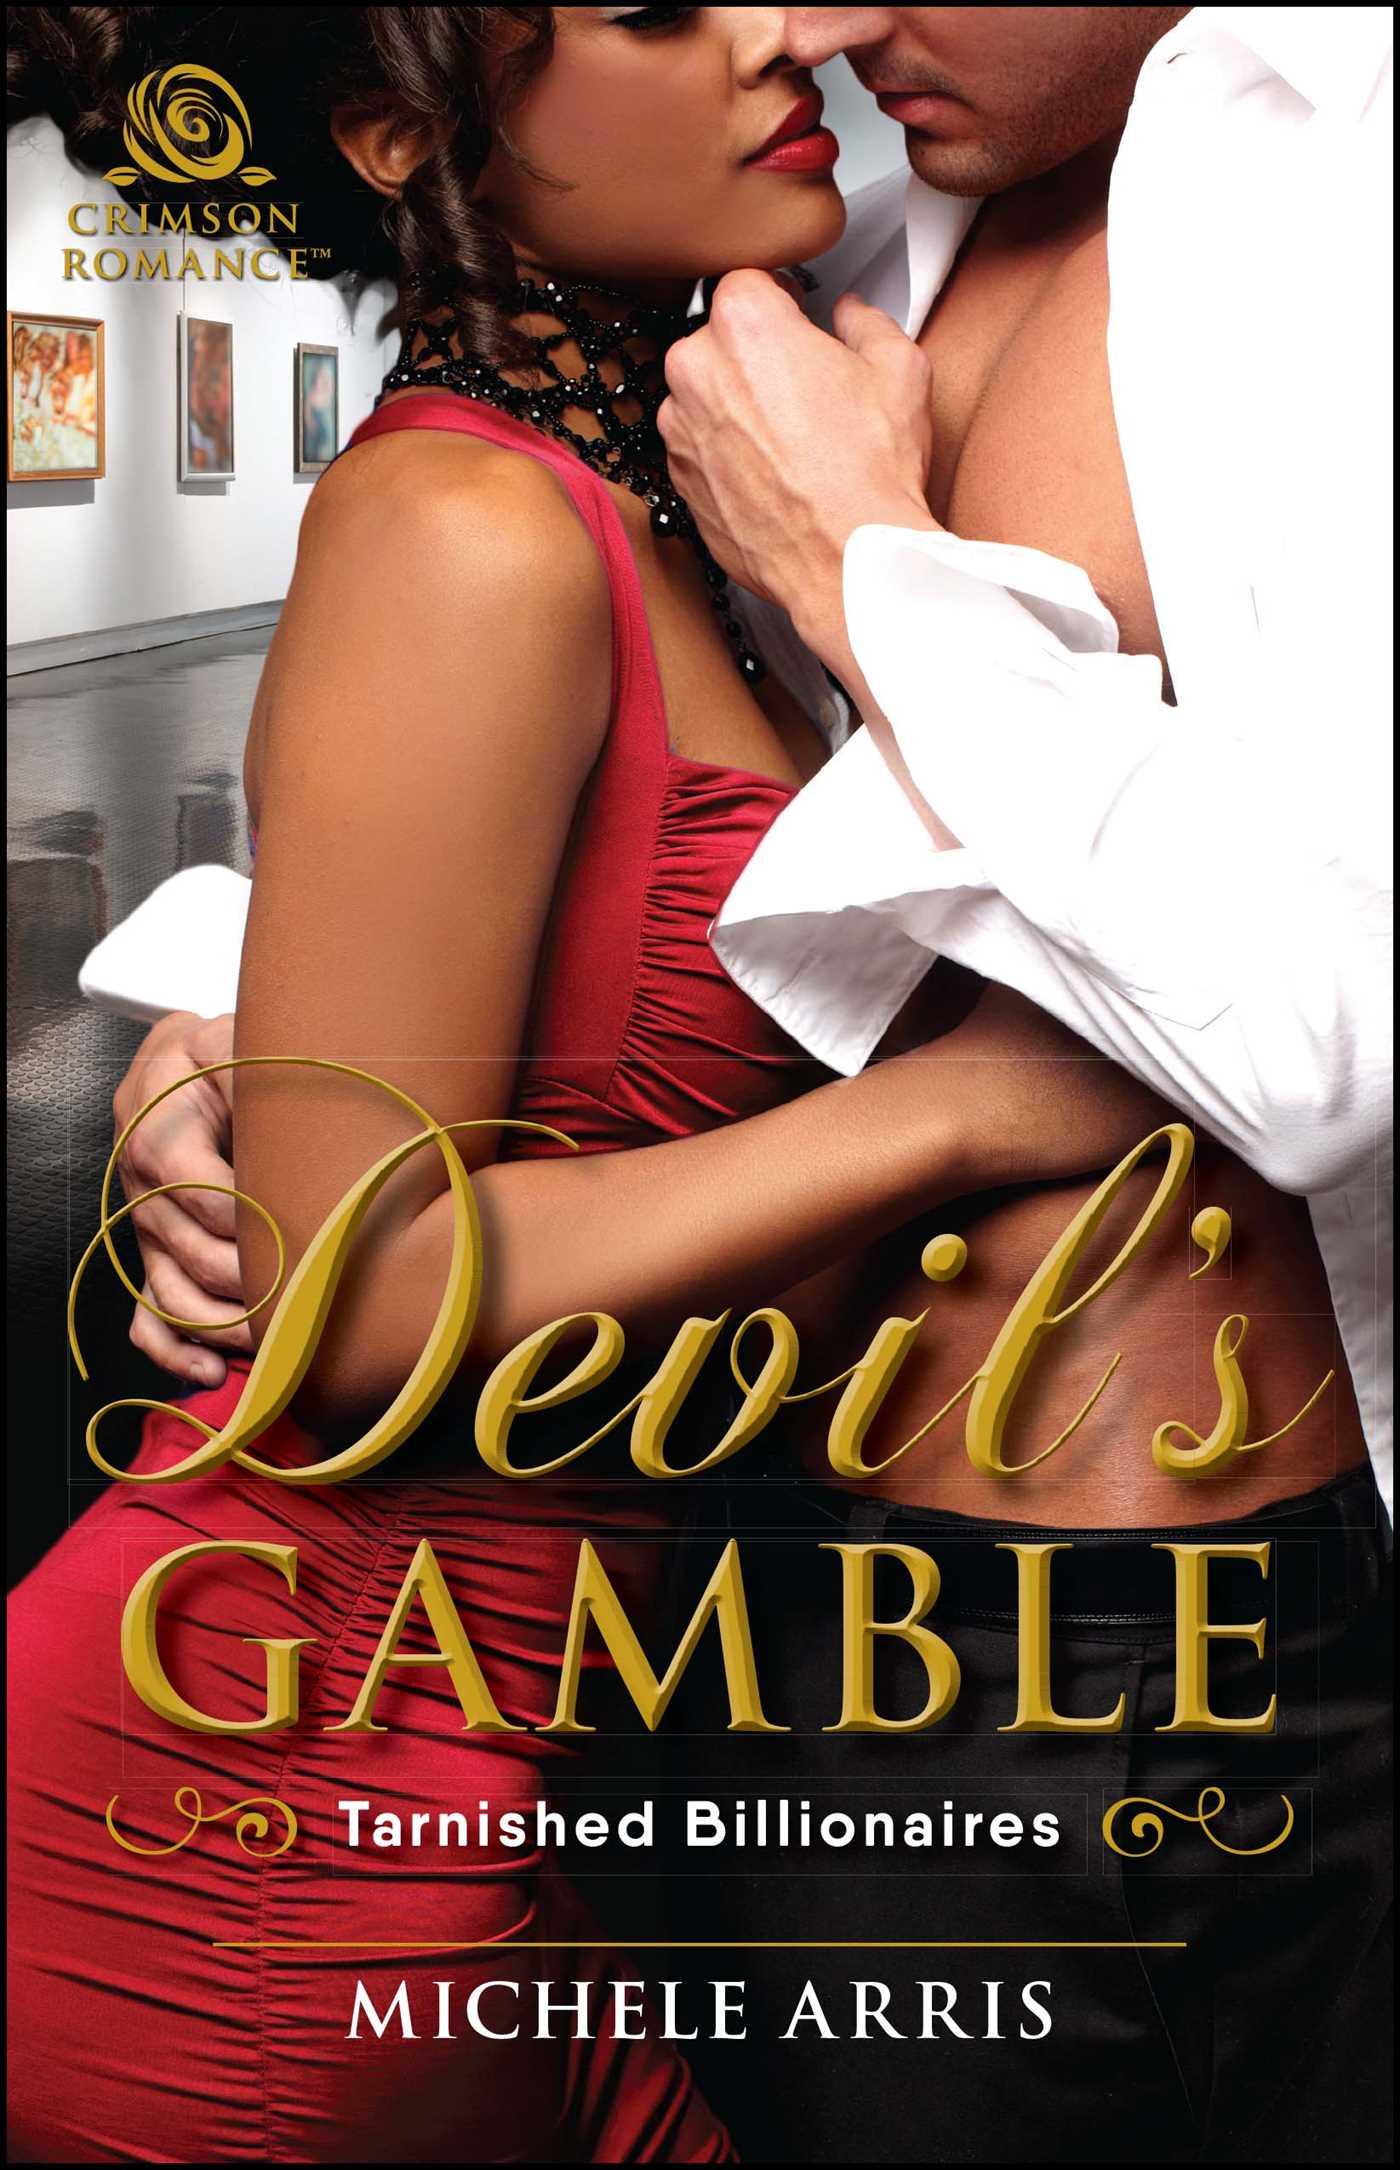 Devils gamble 9781507208076 hr